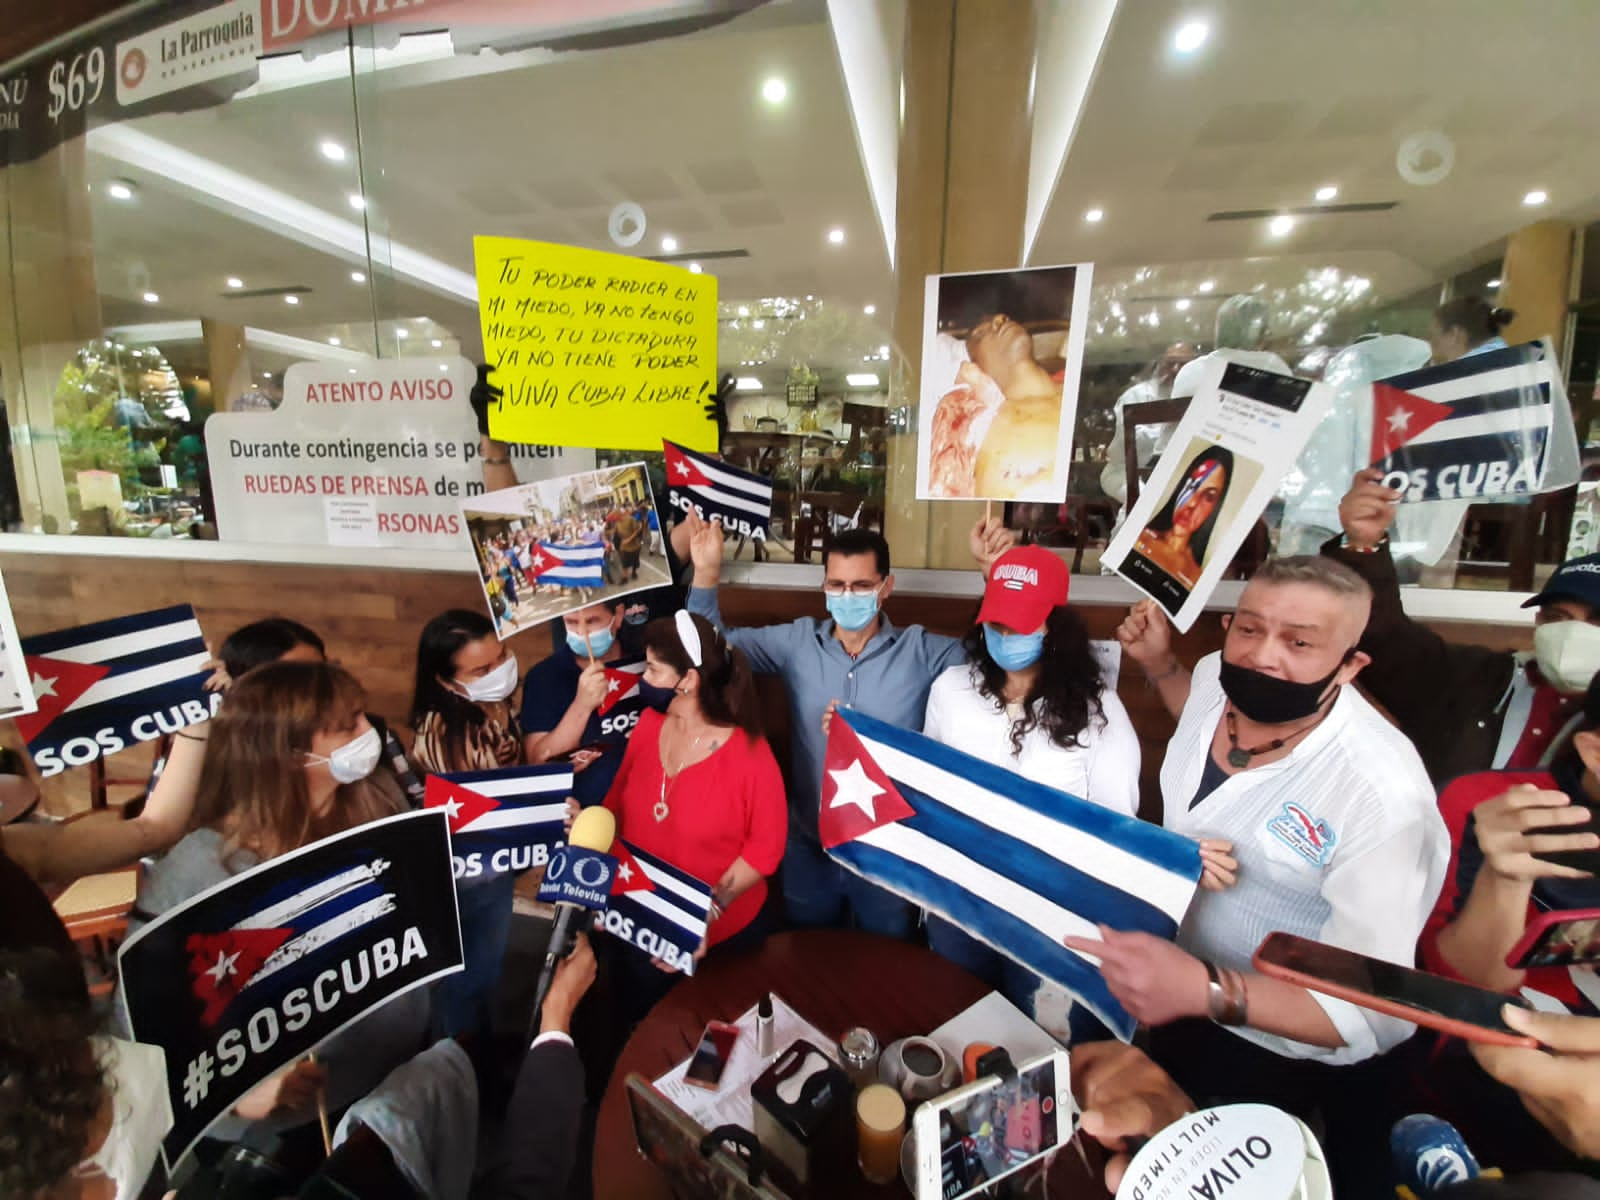 Pese a situación en Cuba, cubanos radicados en Xalapa, festejan levantamiento contra Díaz-Canel